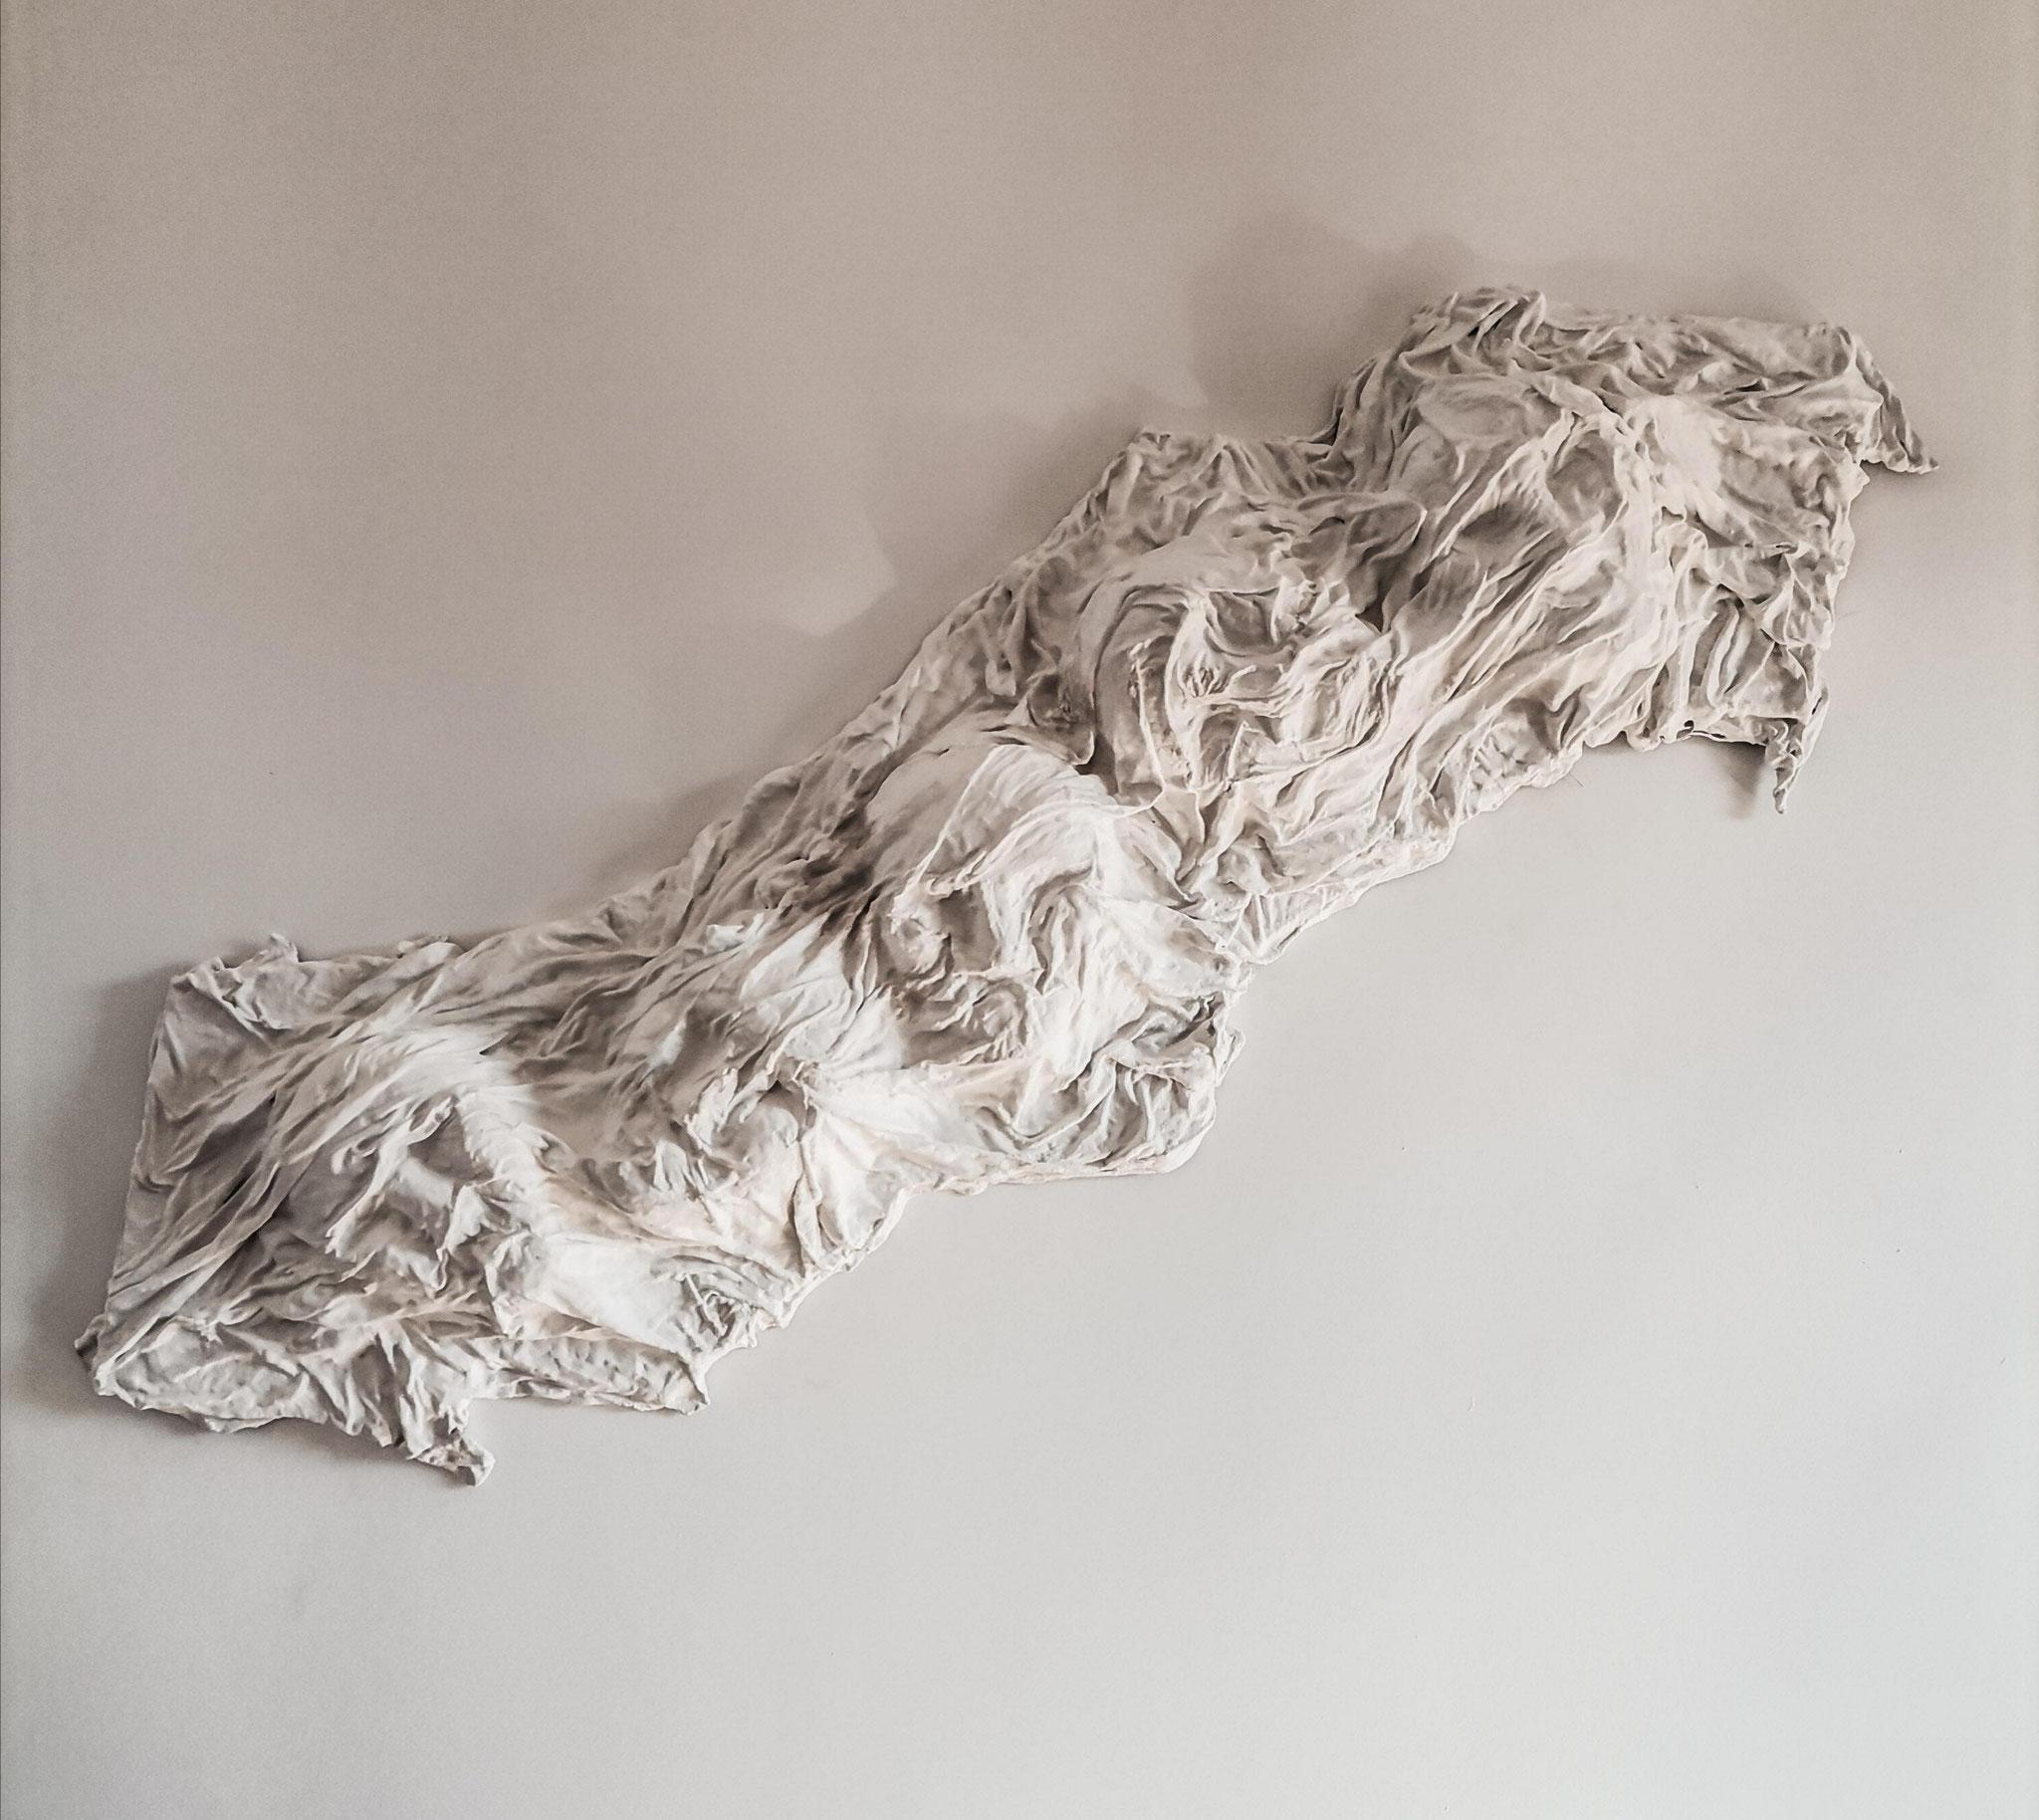 HEAVY SLEEP, mixed media (2021), commissioned work